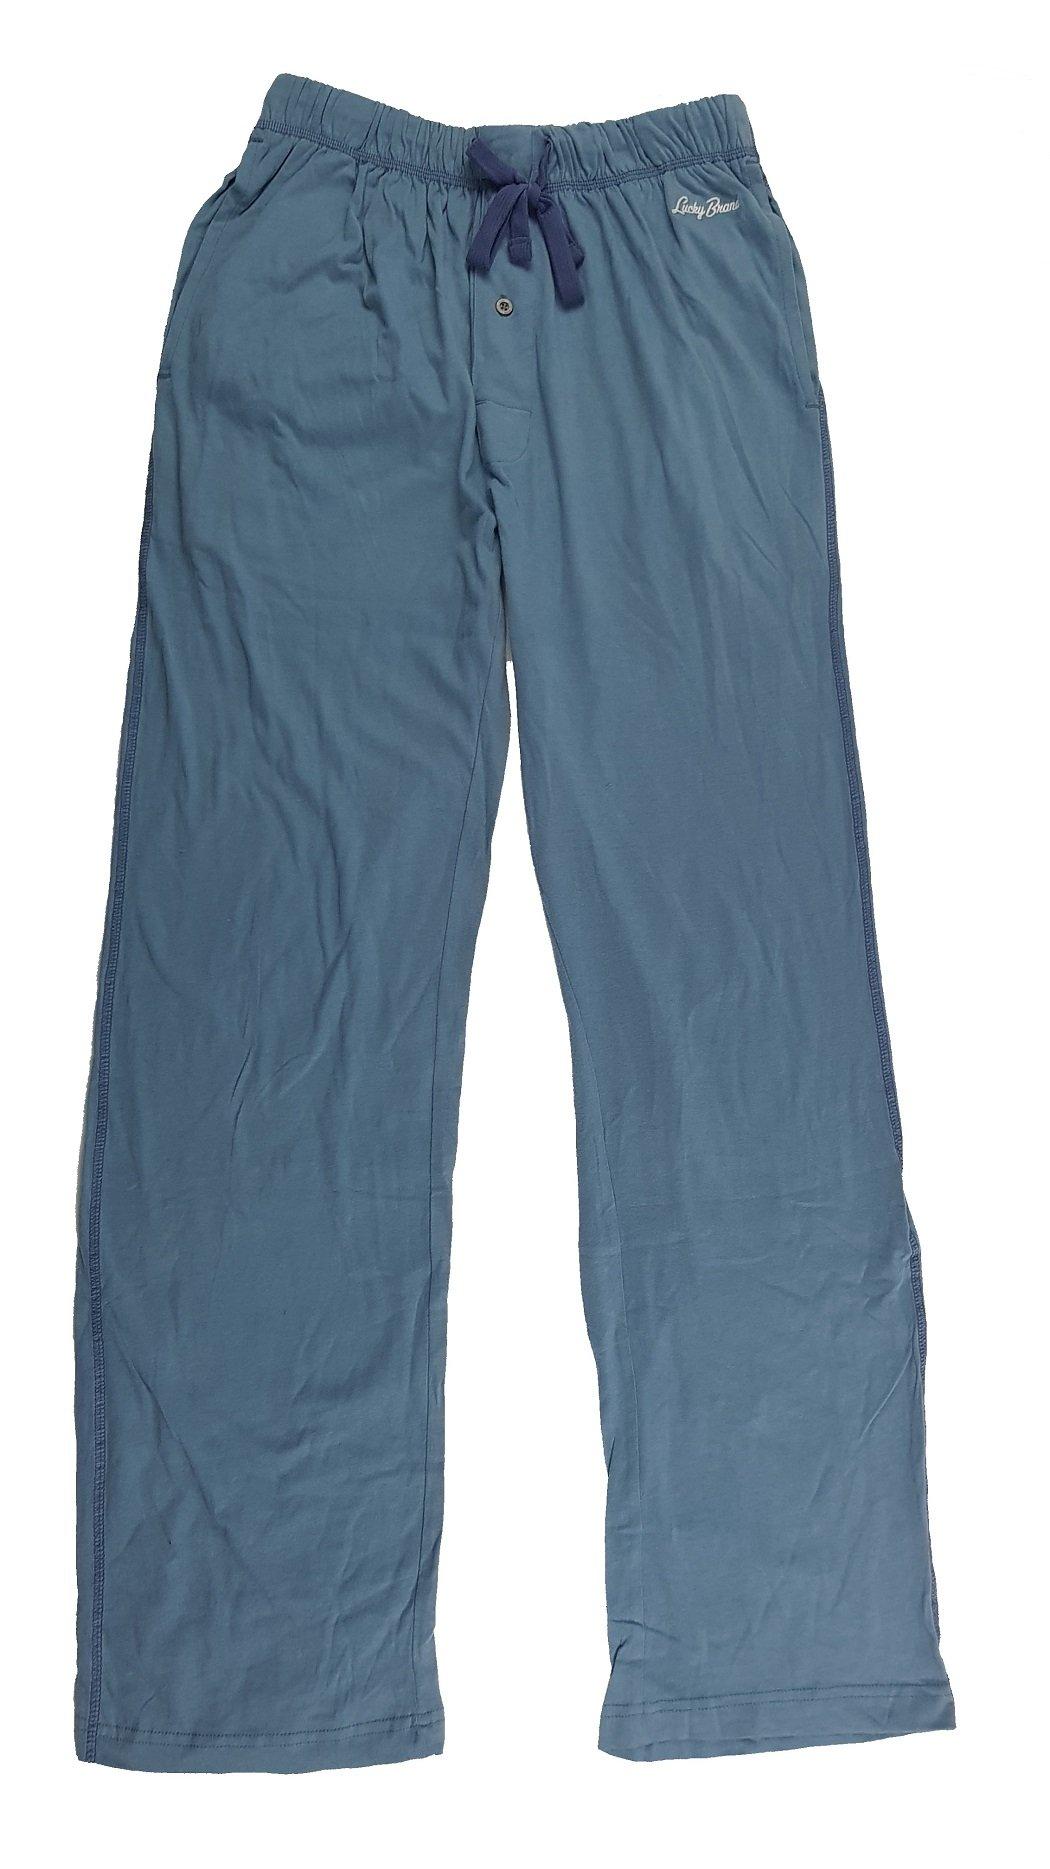 Lucky Brand Men's Jersey Knit Lounge Pajama Pant (Captains Blue, S)